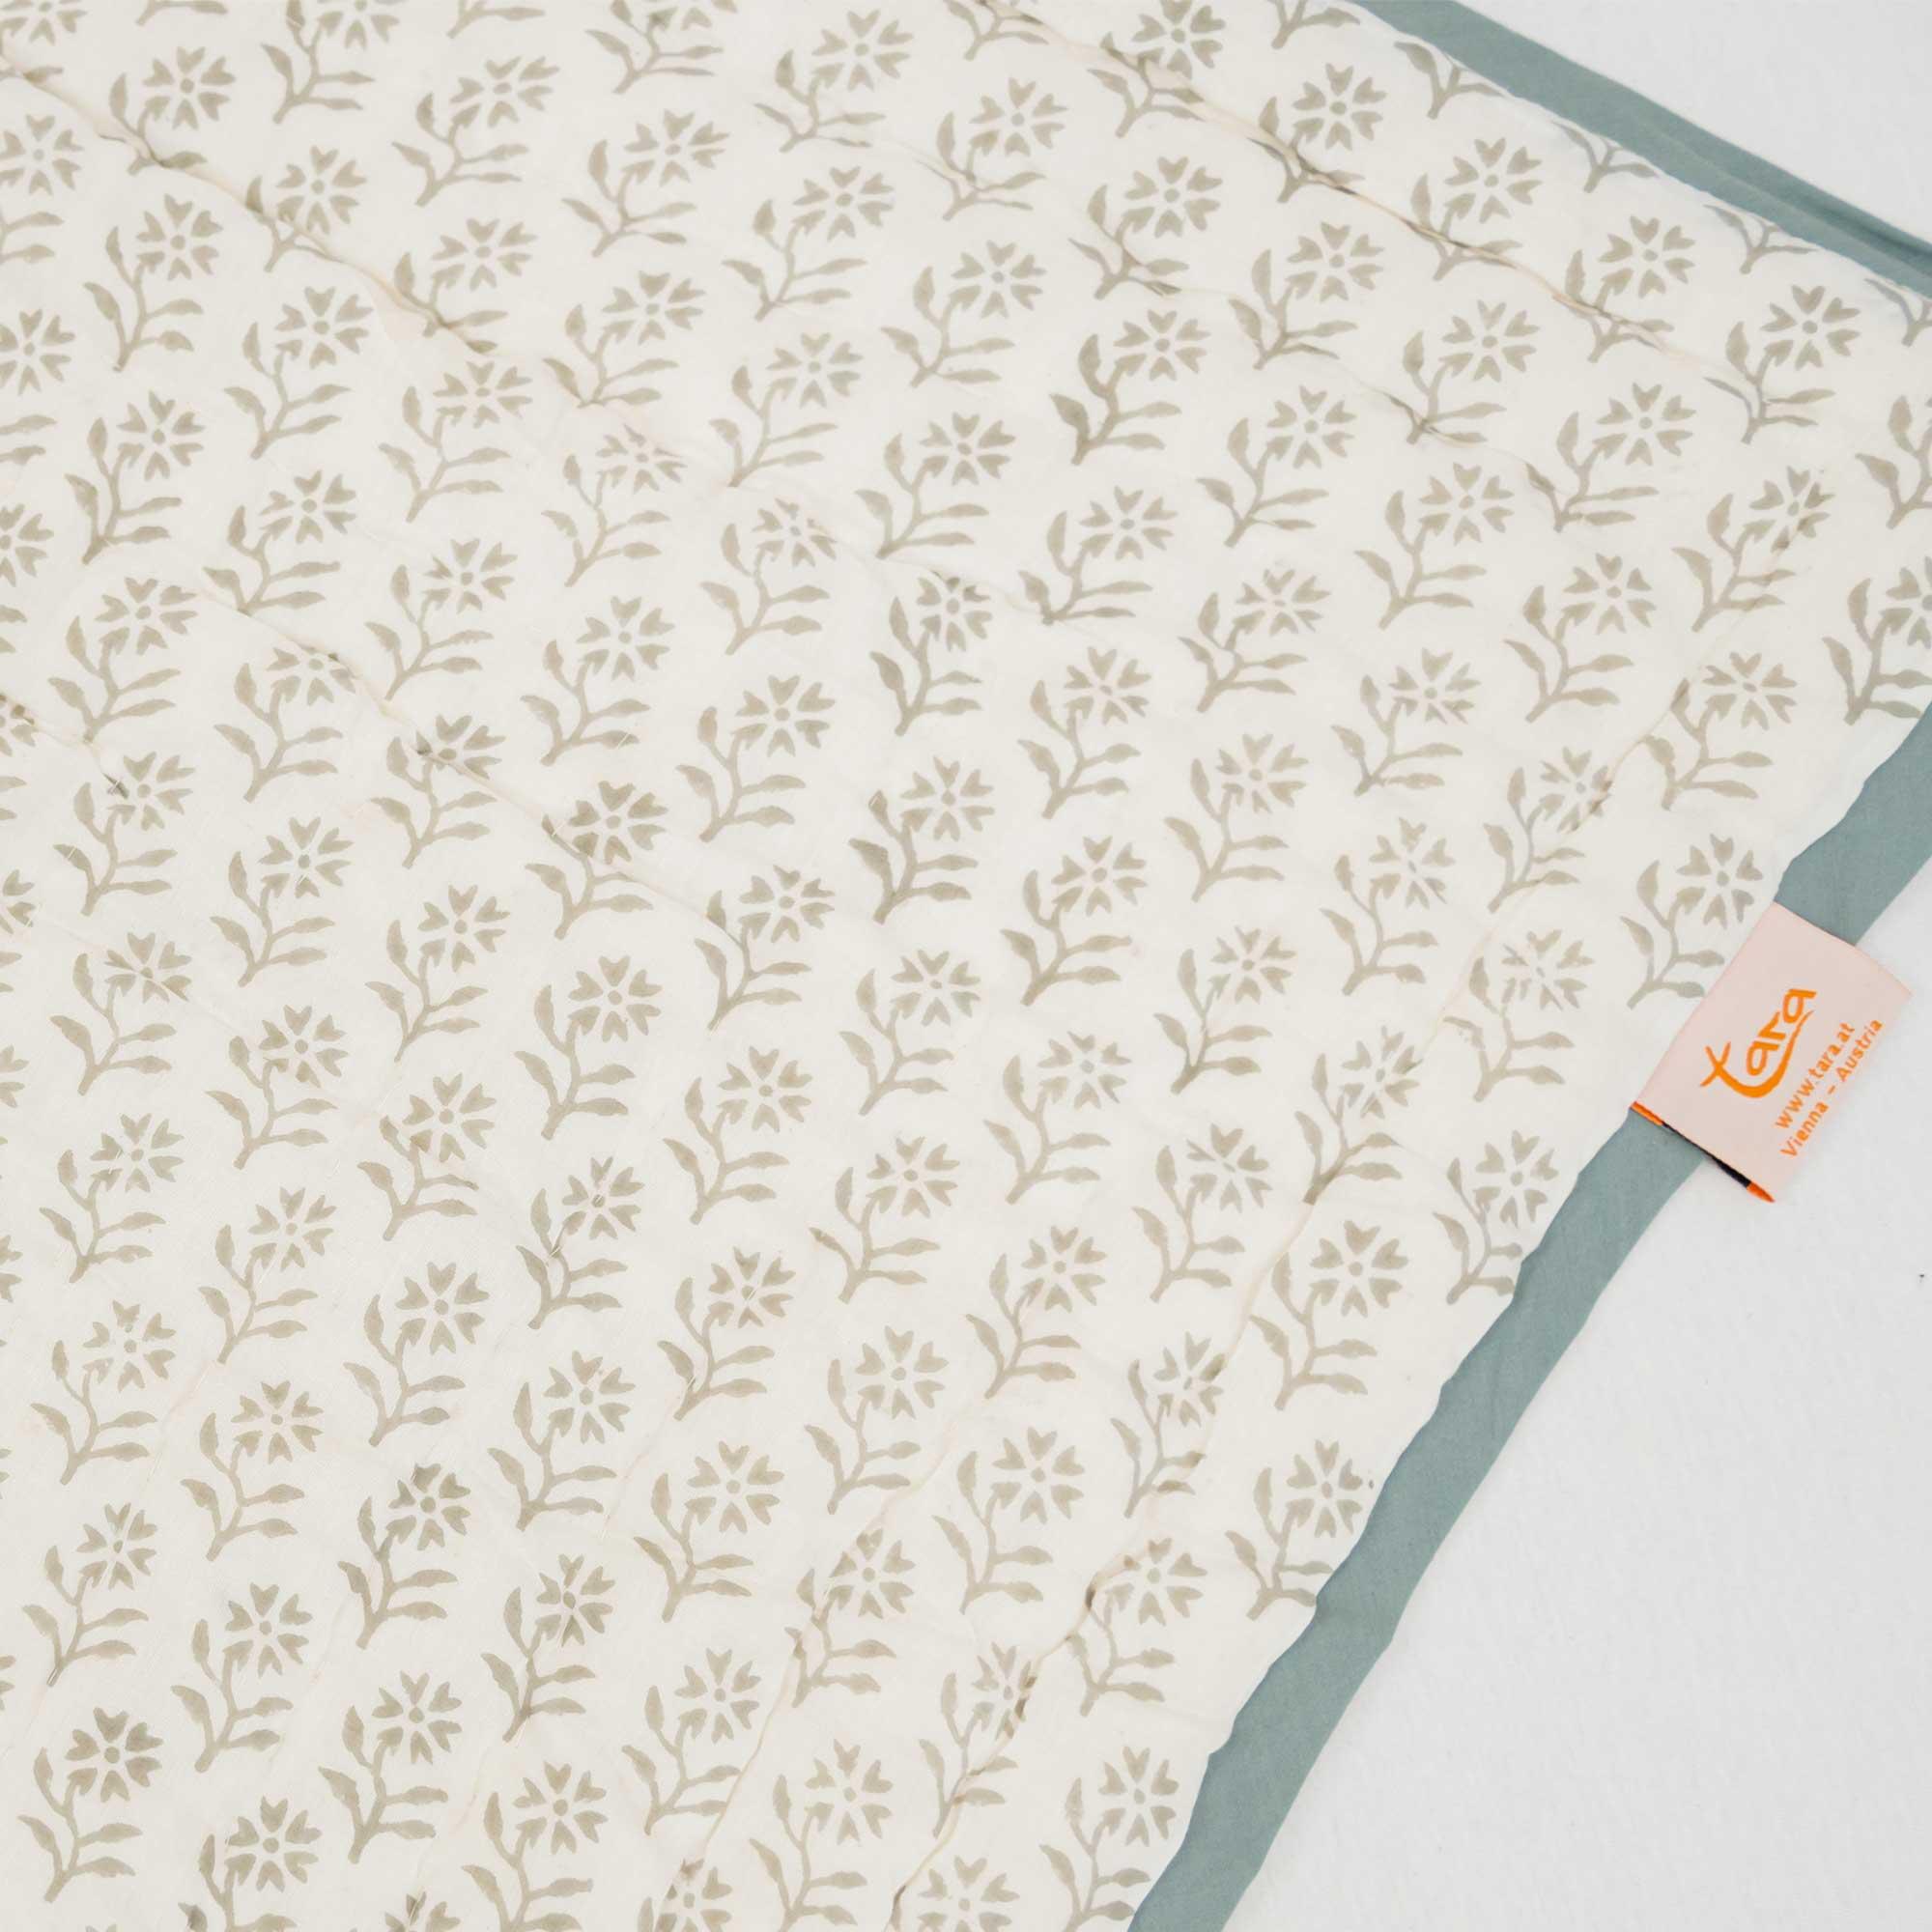 Tara-Textile - indische Decke - Kuscheldecke Mala